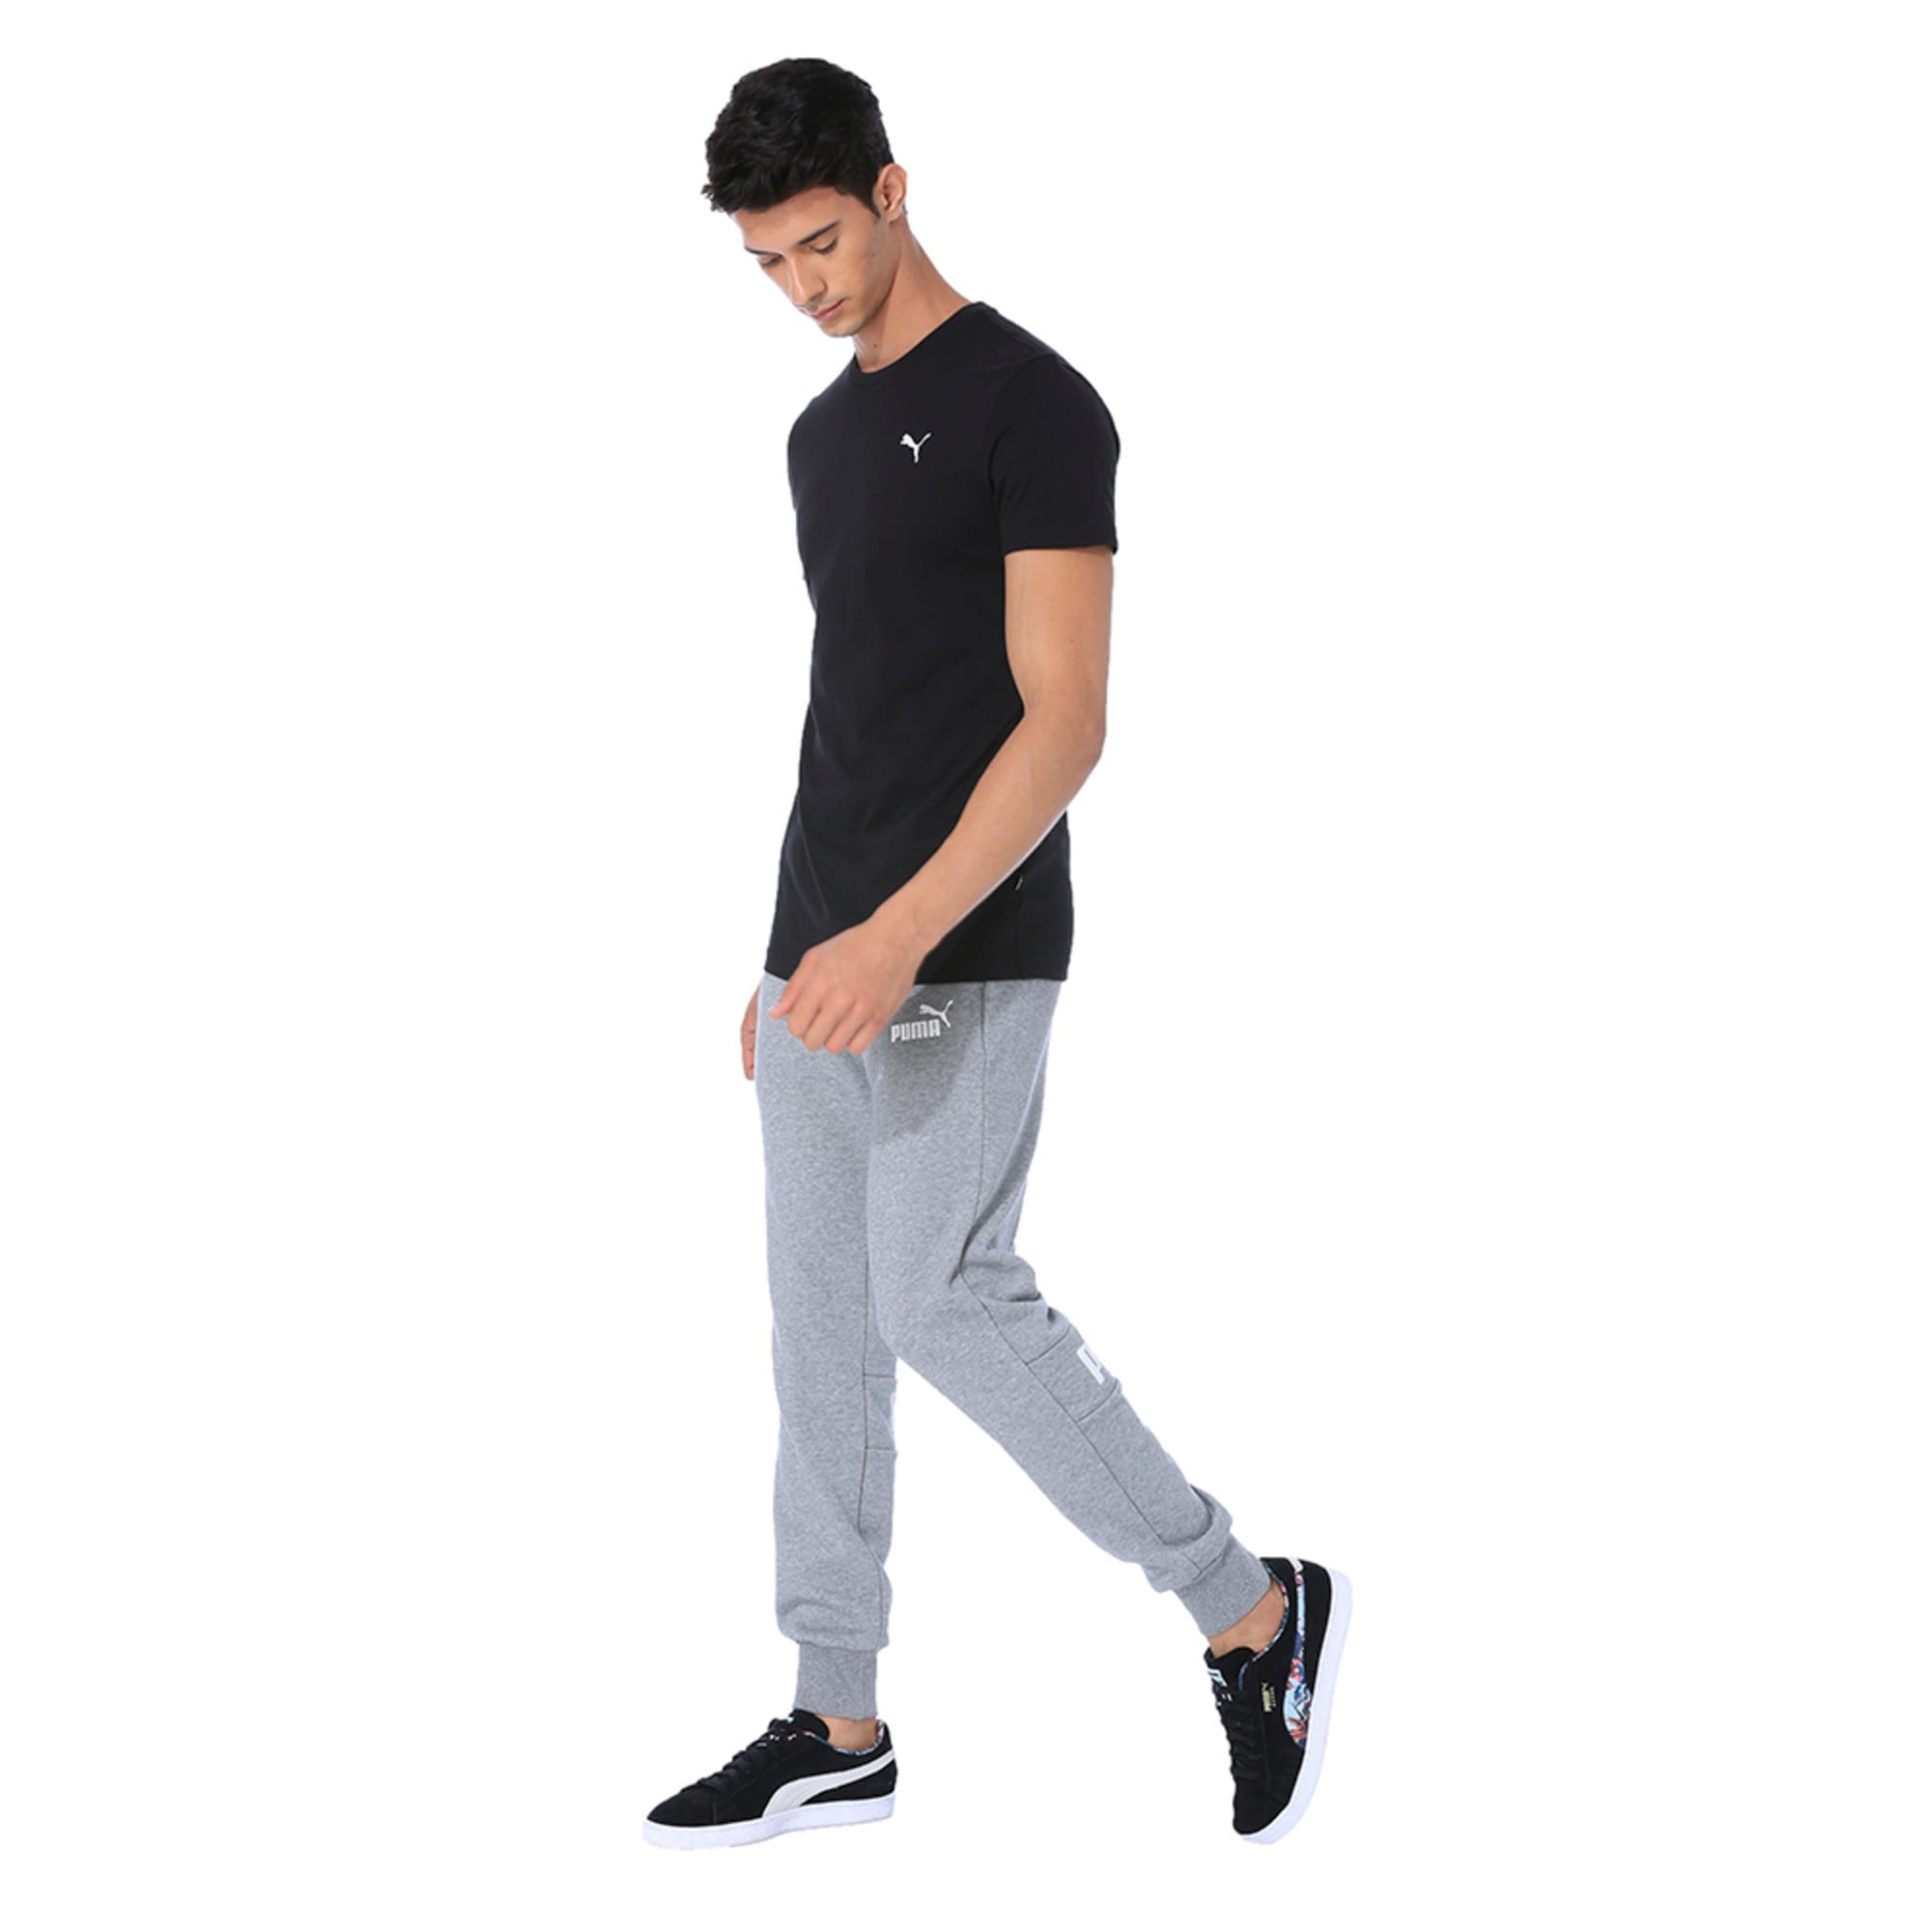 Thumbnail 1 of Men's Essentials Small Logo T-Shirt, Cotton Black, medium-IND